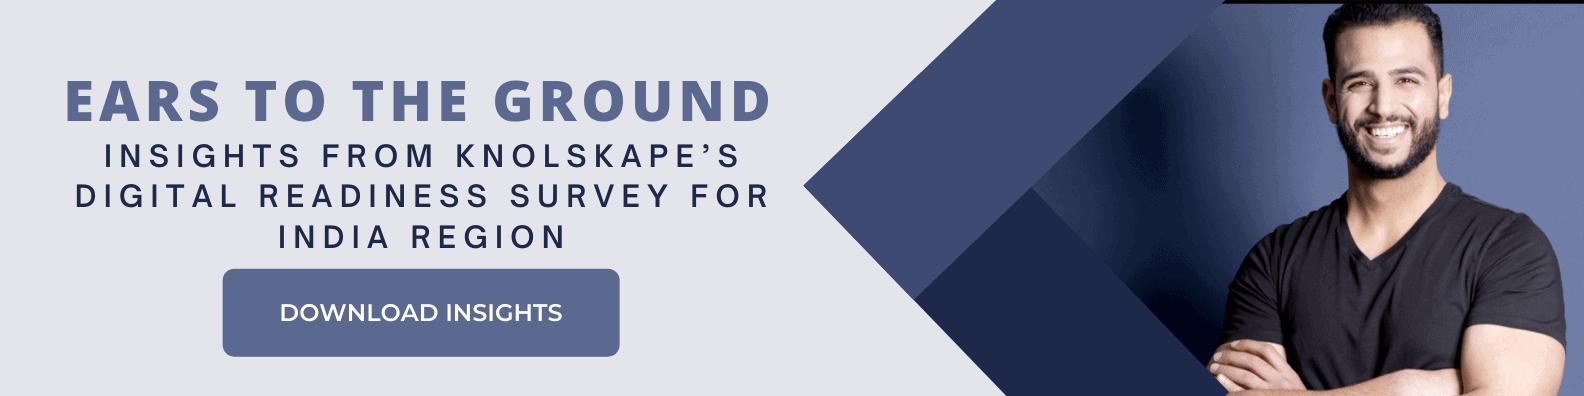 digital readiness survey